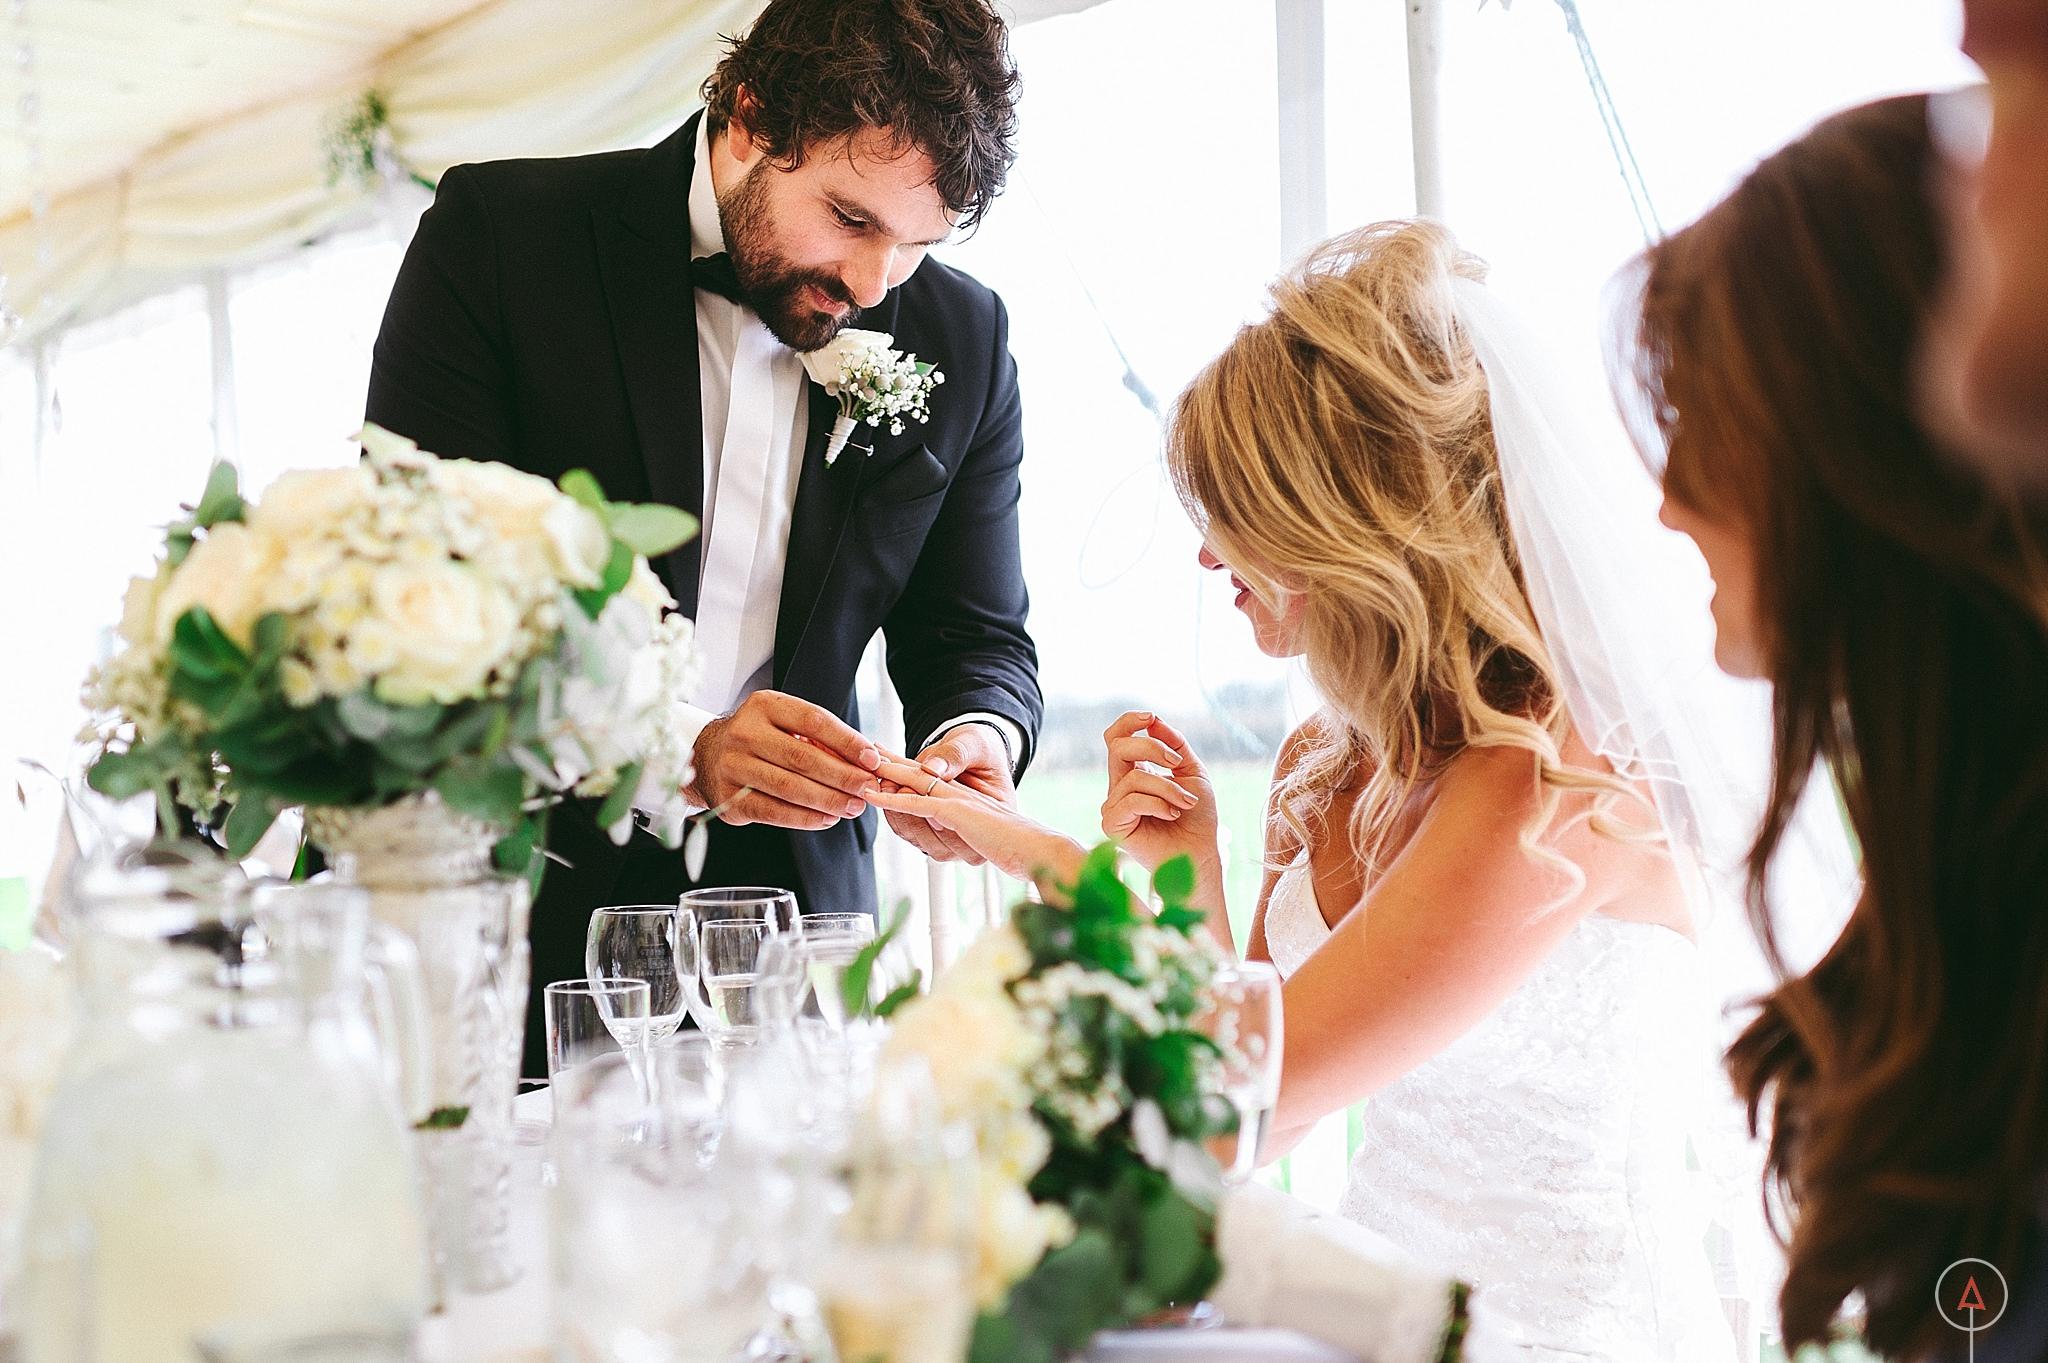 cardiff-wedding-photographer-aga-tomaszek_0396